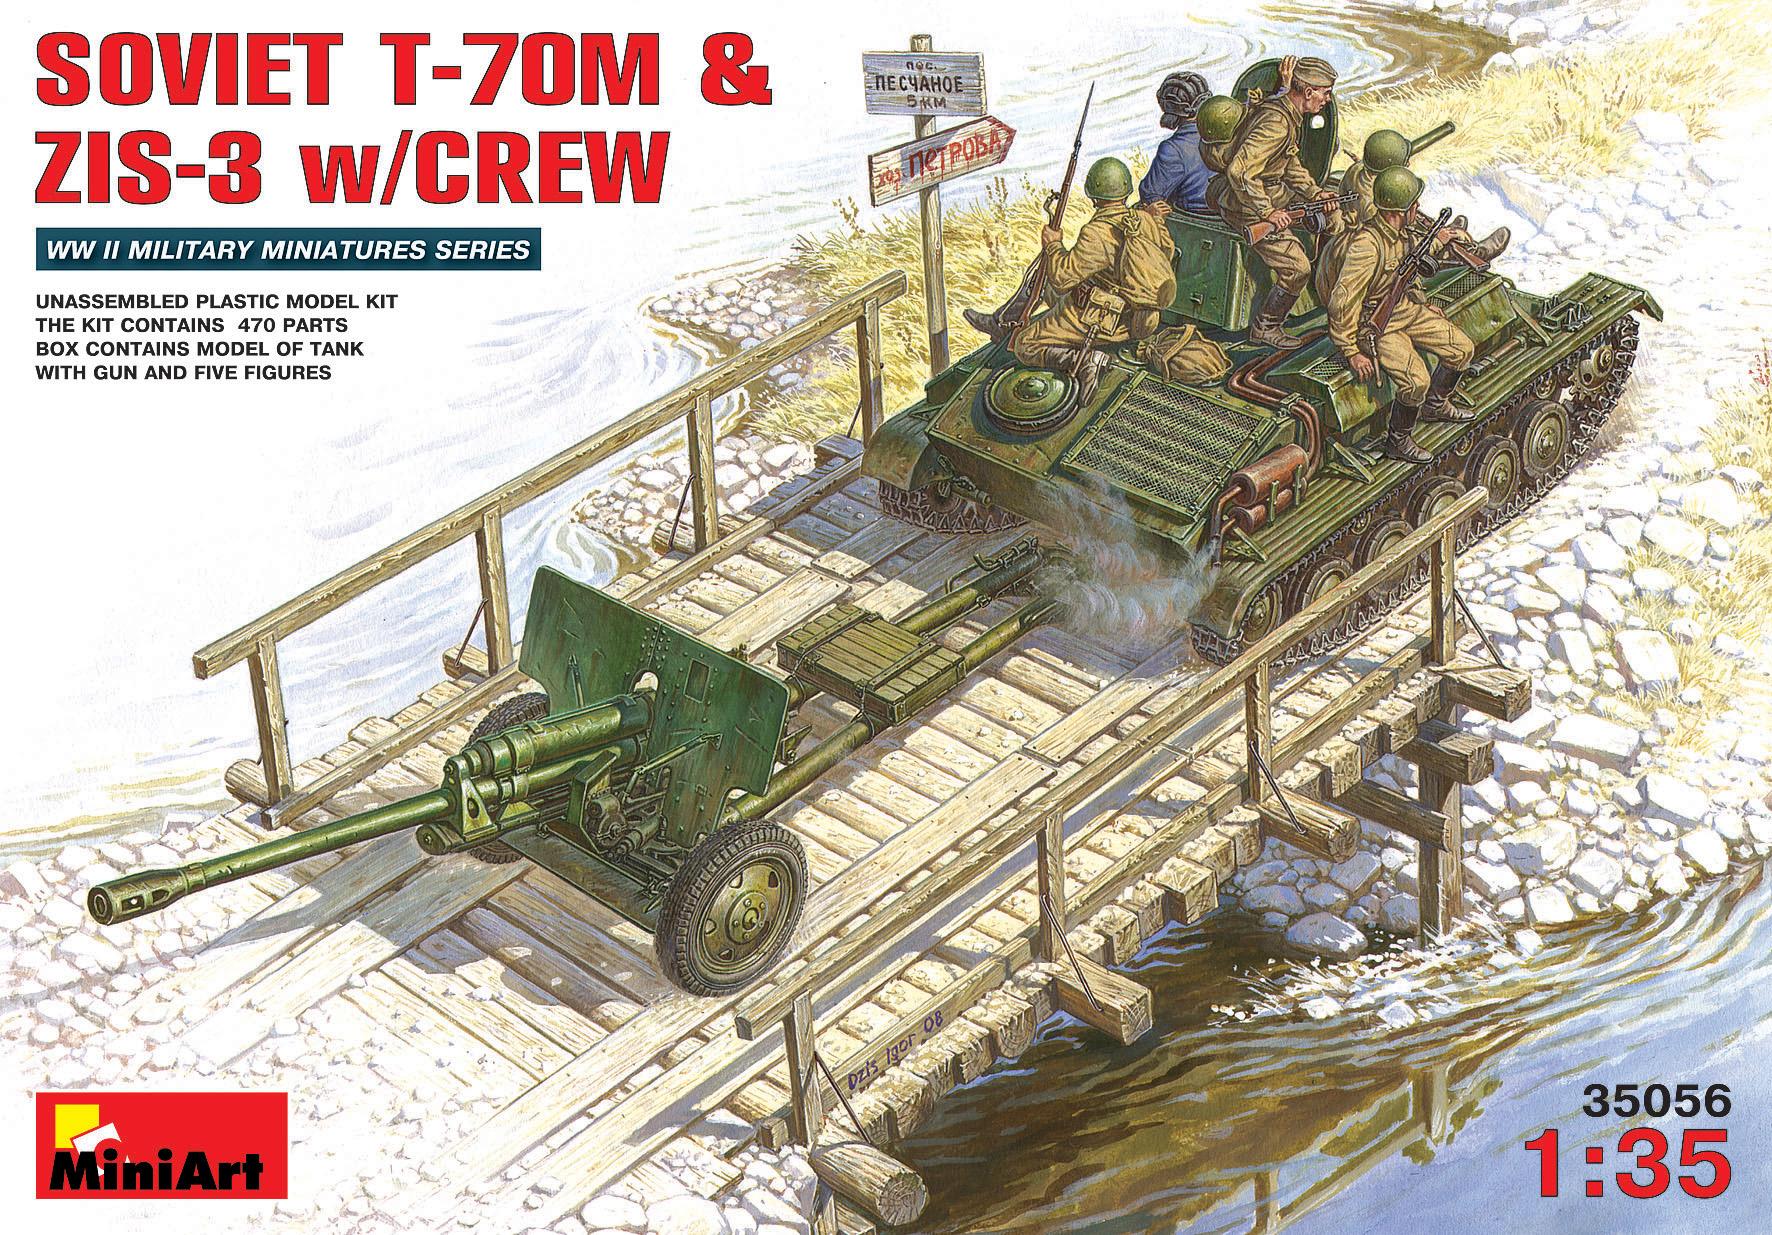 SOVIET T-70M & ZIS-3 w/CREW